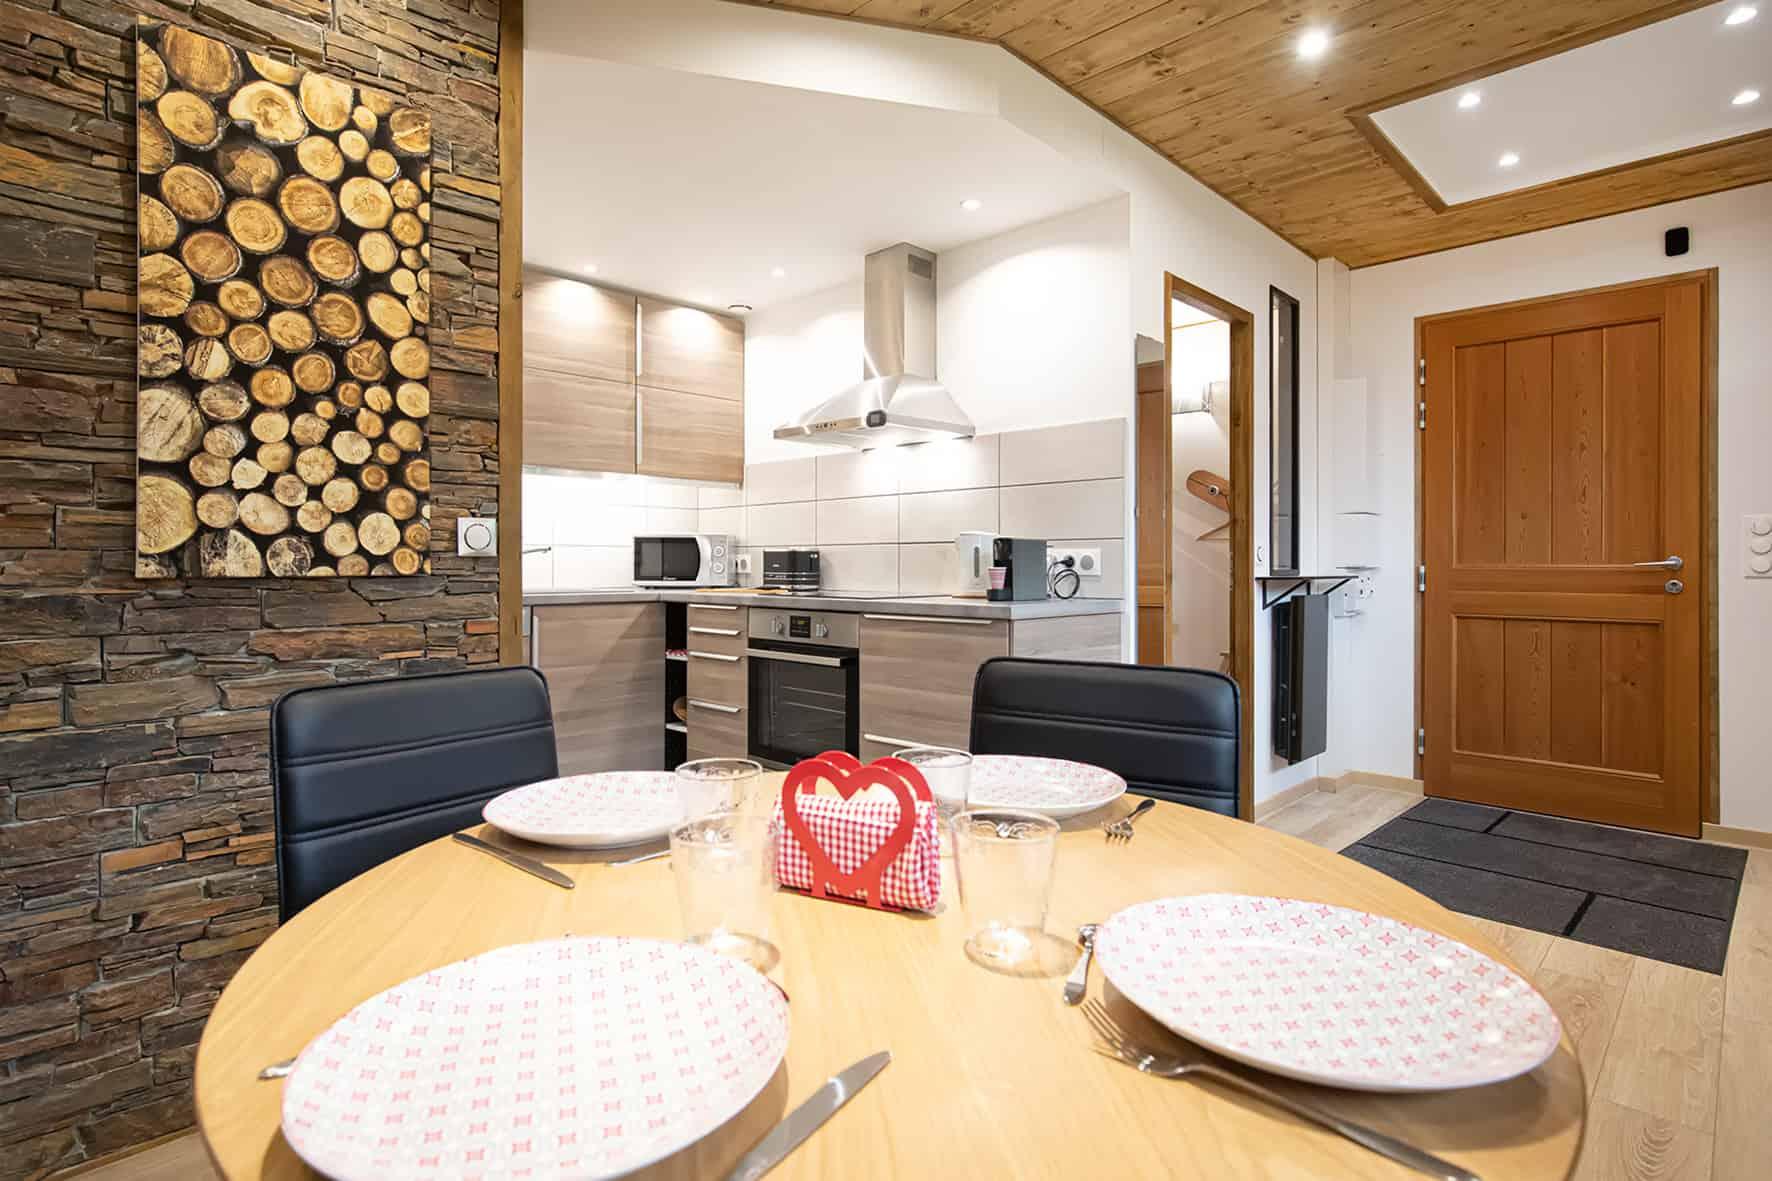 cuisine et salle à manger gîte savoie gîte avrieux